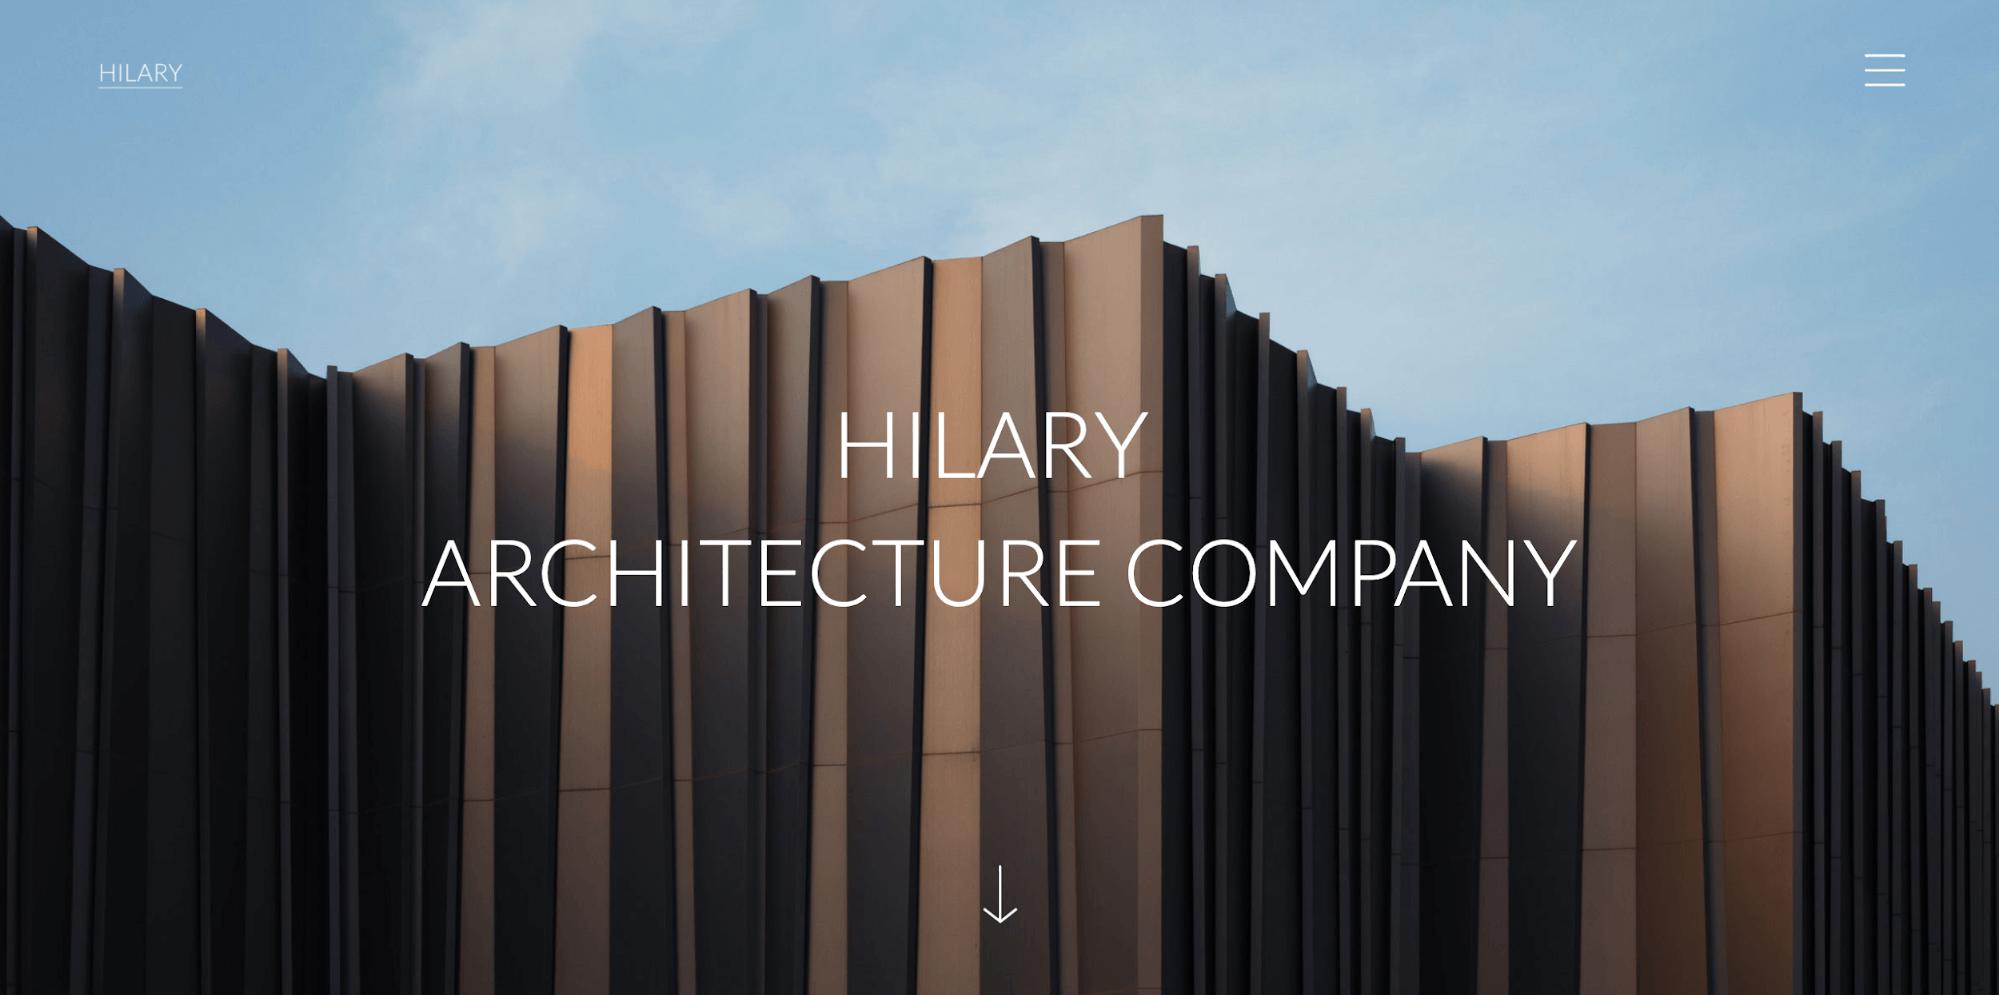 Hilary-architecture website template-ucraft